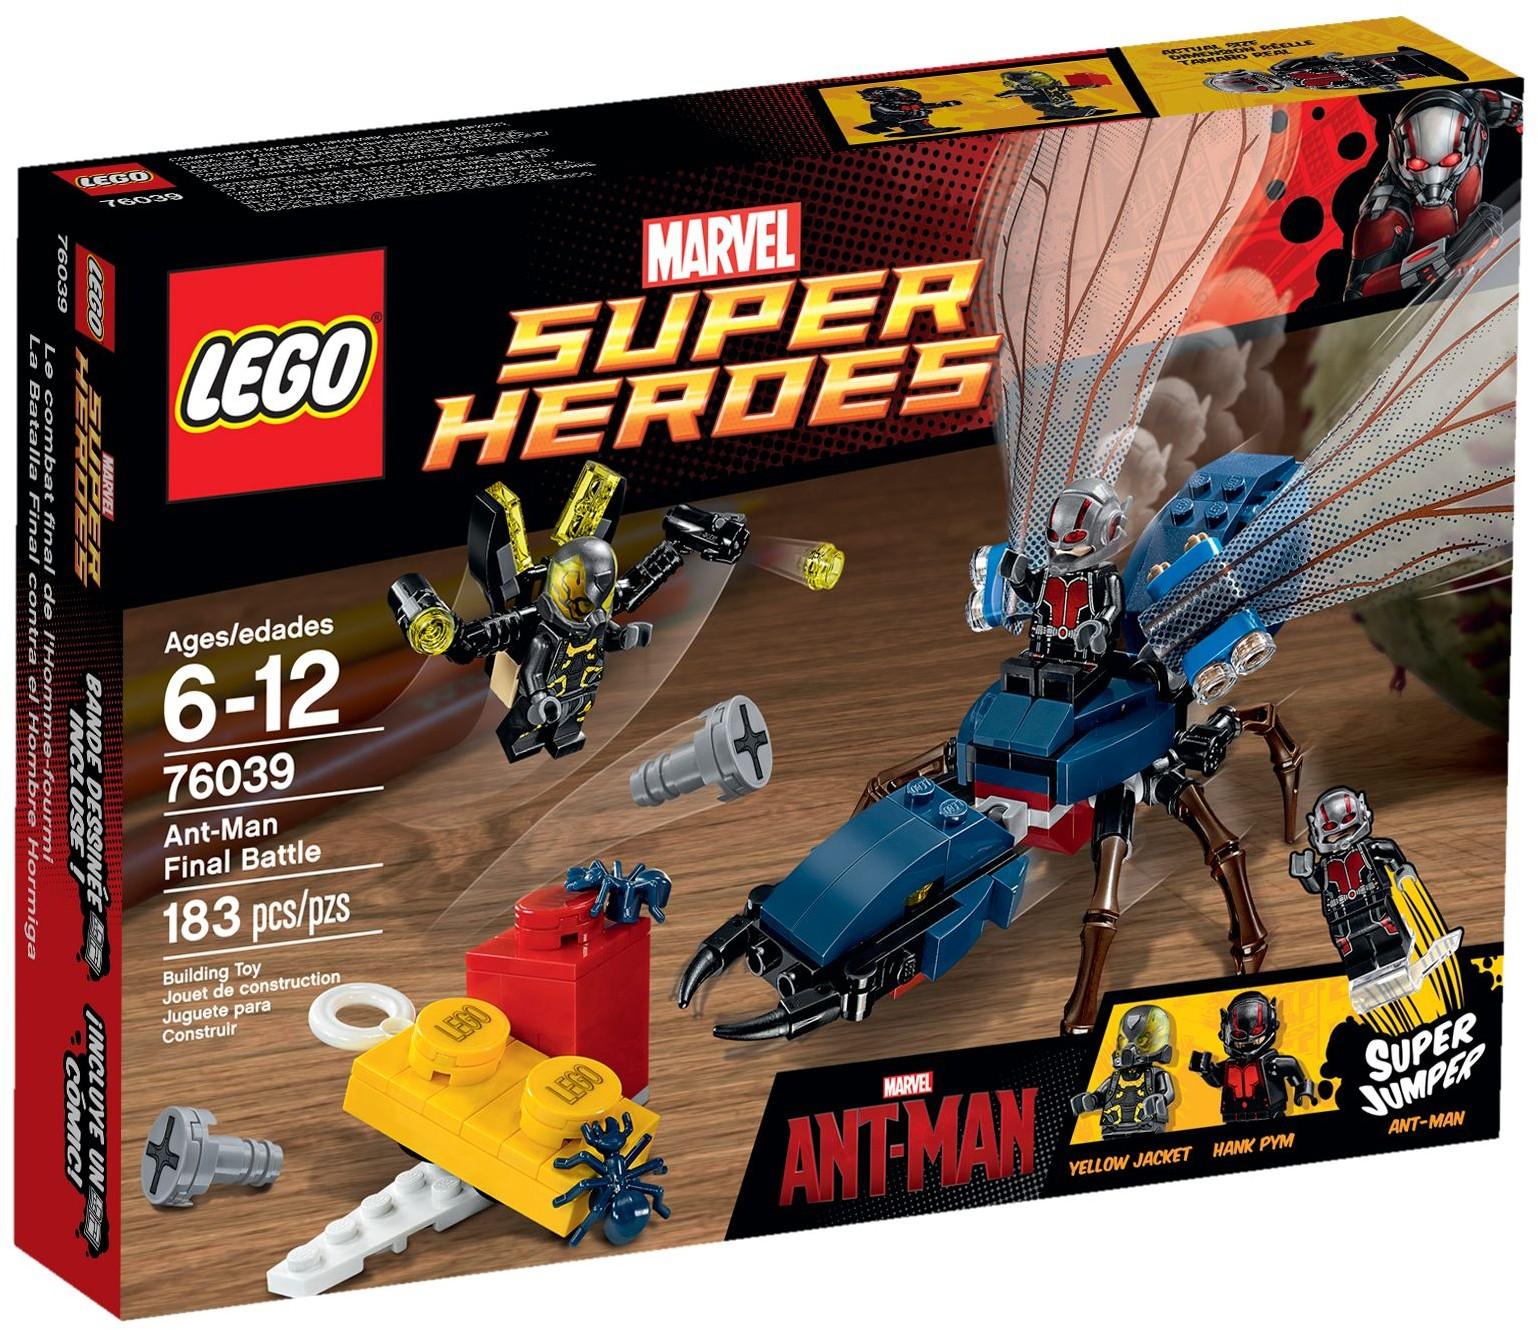 LEGO 76039 - Super Heroes - Ant-Man Final Battle